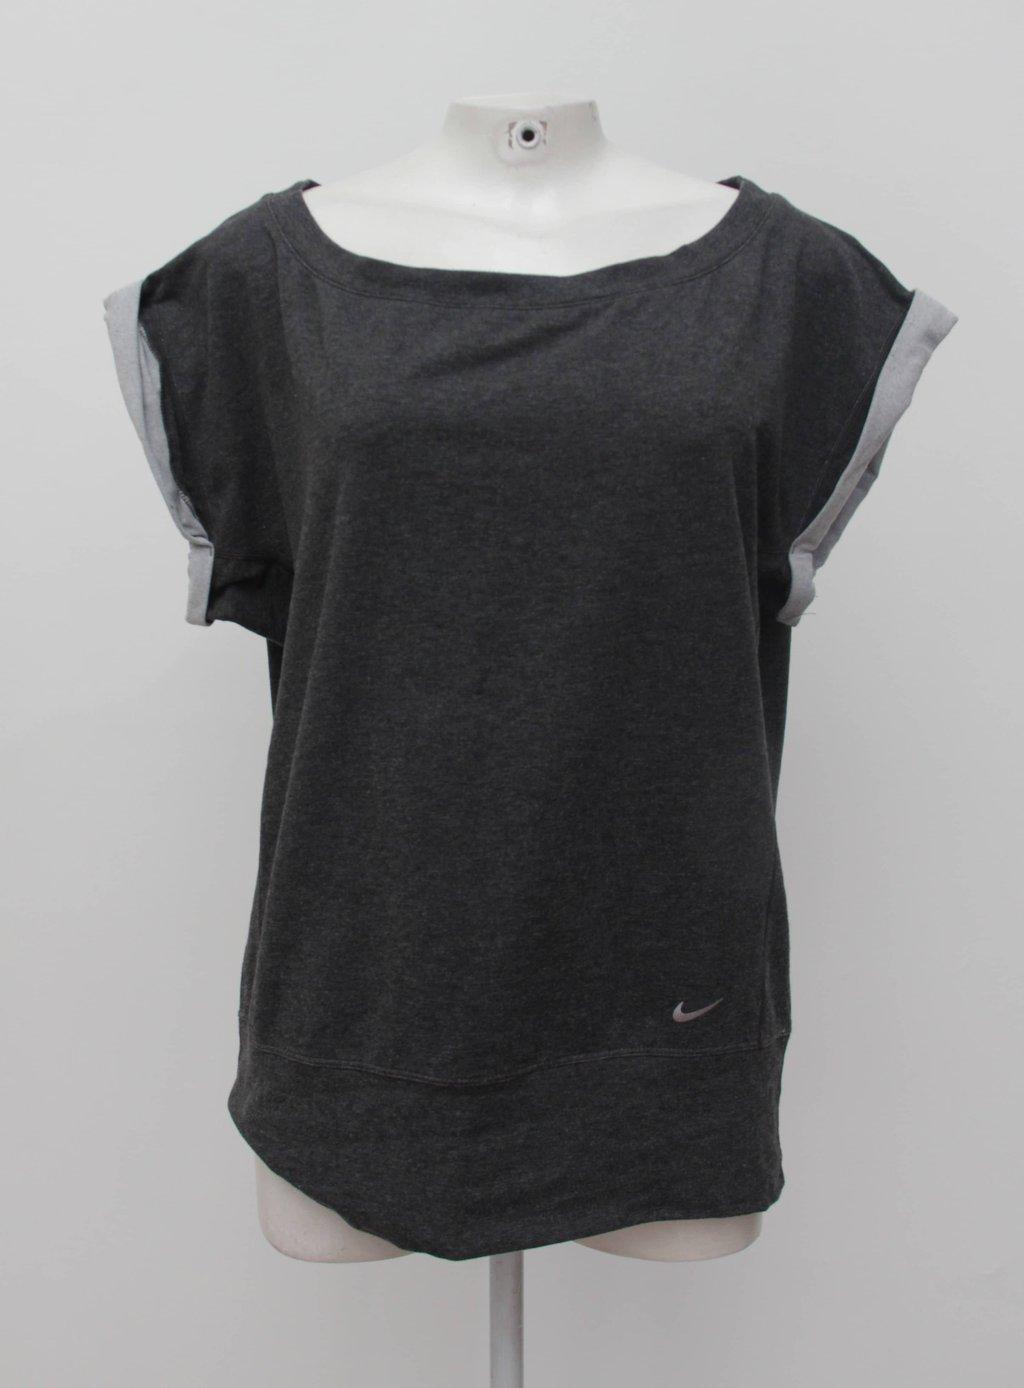 Camiseta cinza nike